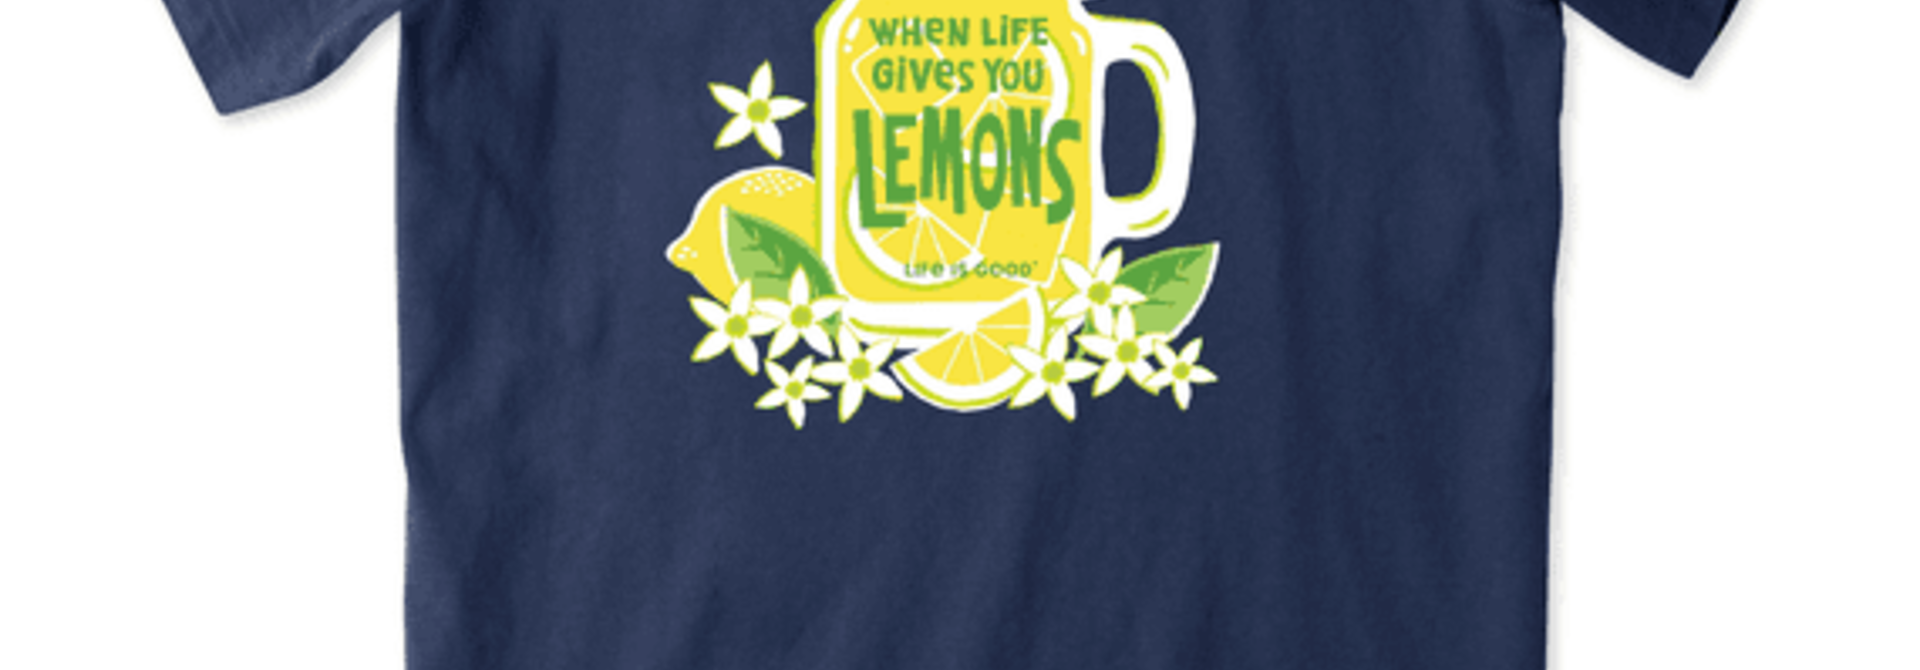 W's Life Gives You Lemons Short Sleeved Crusher Tee, Darkest Blue